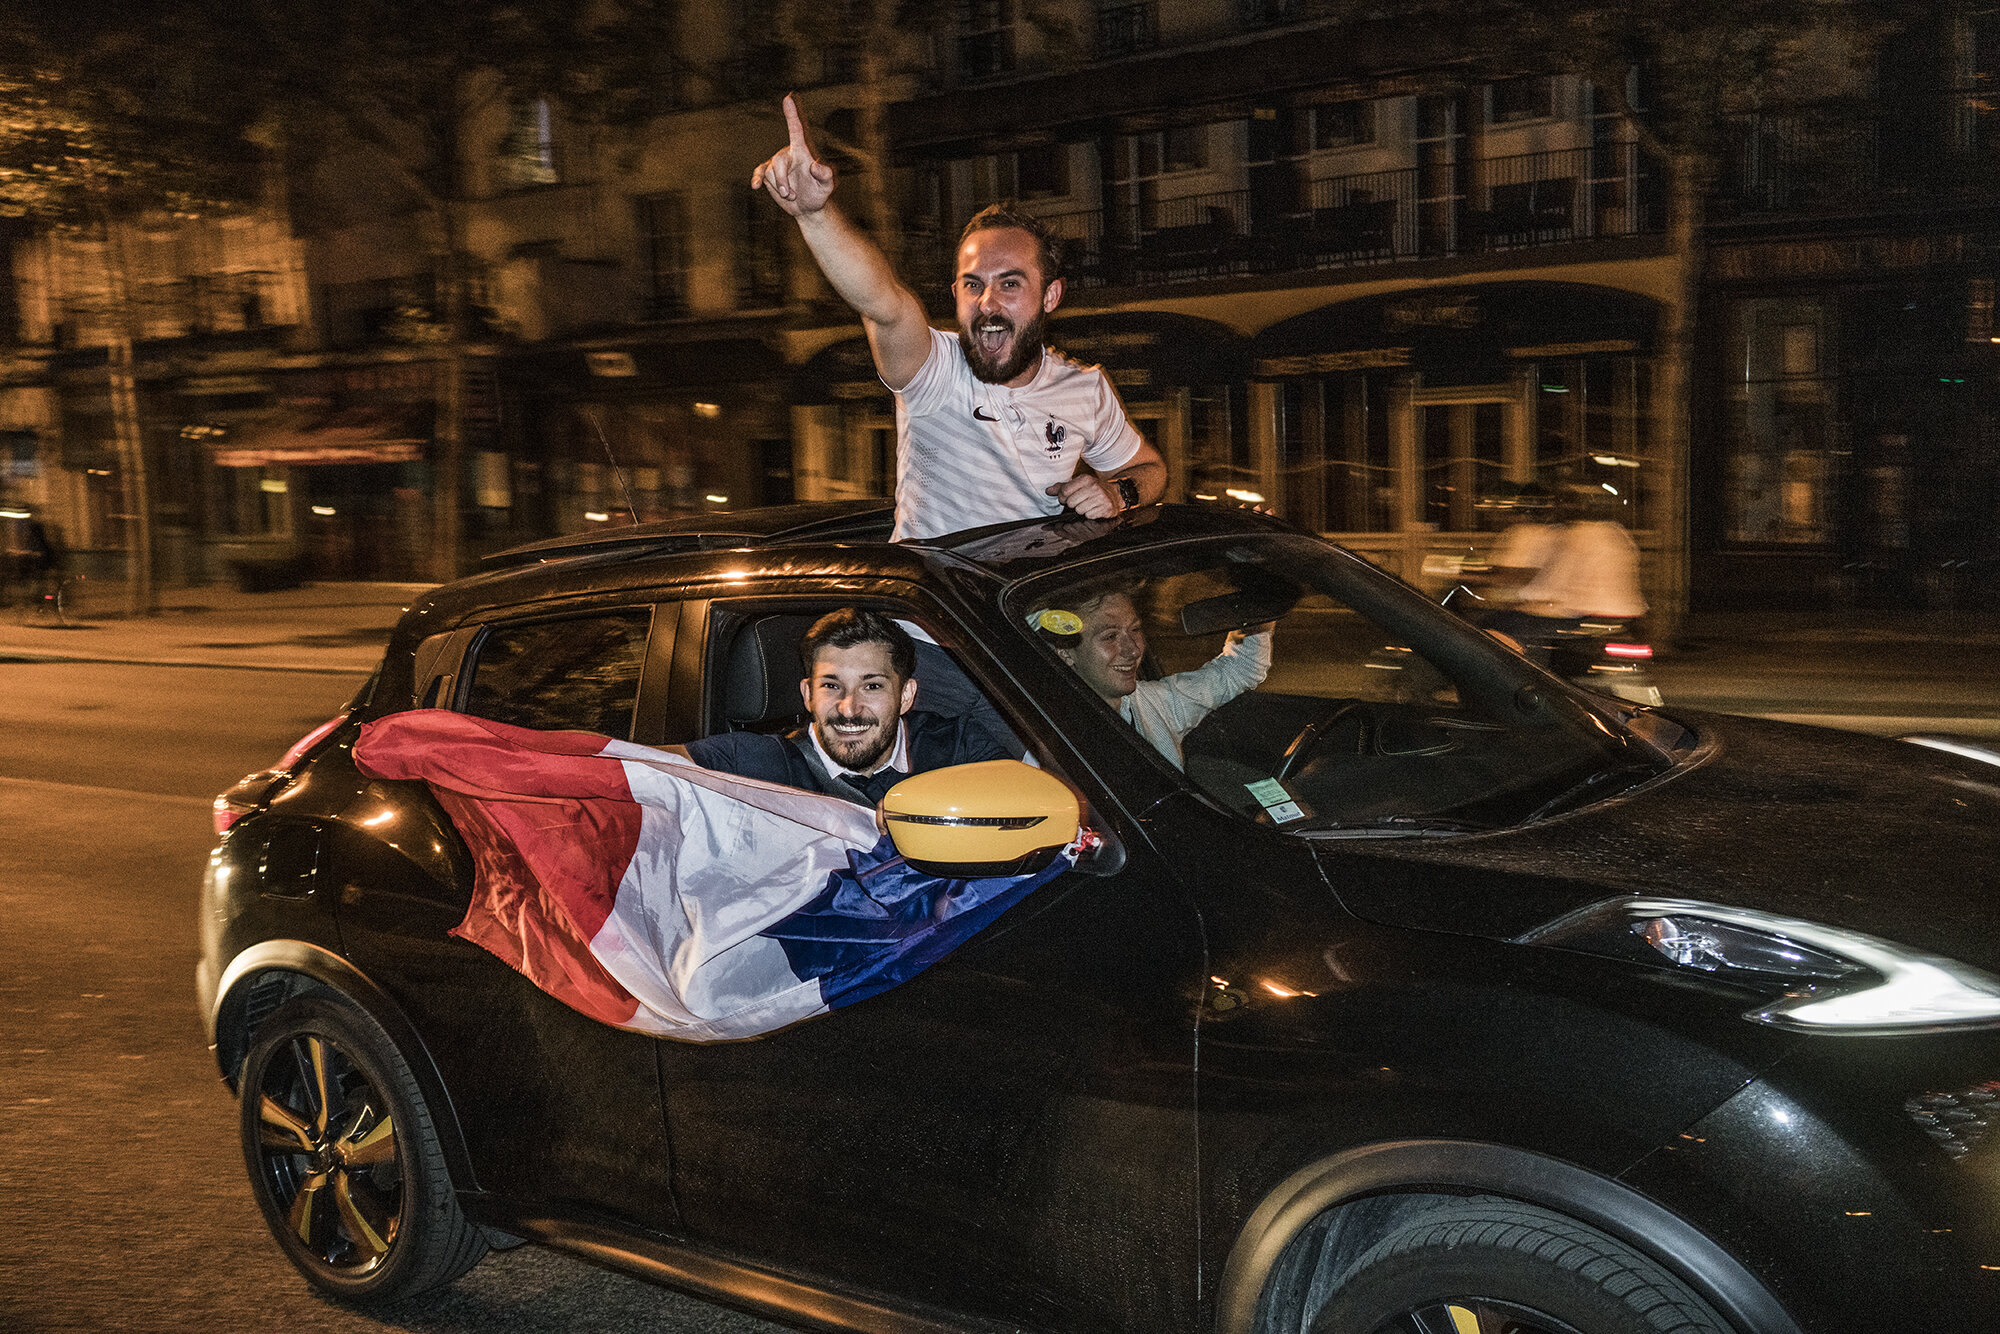 Paris_Street_2018_In_Car_Celebration-008.jpg